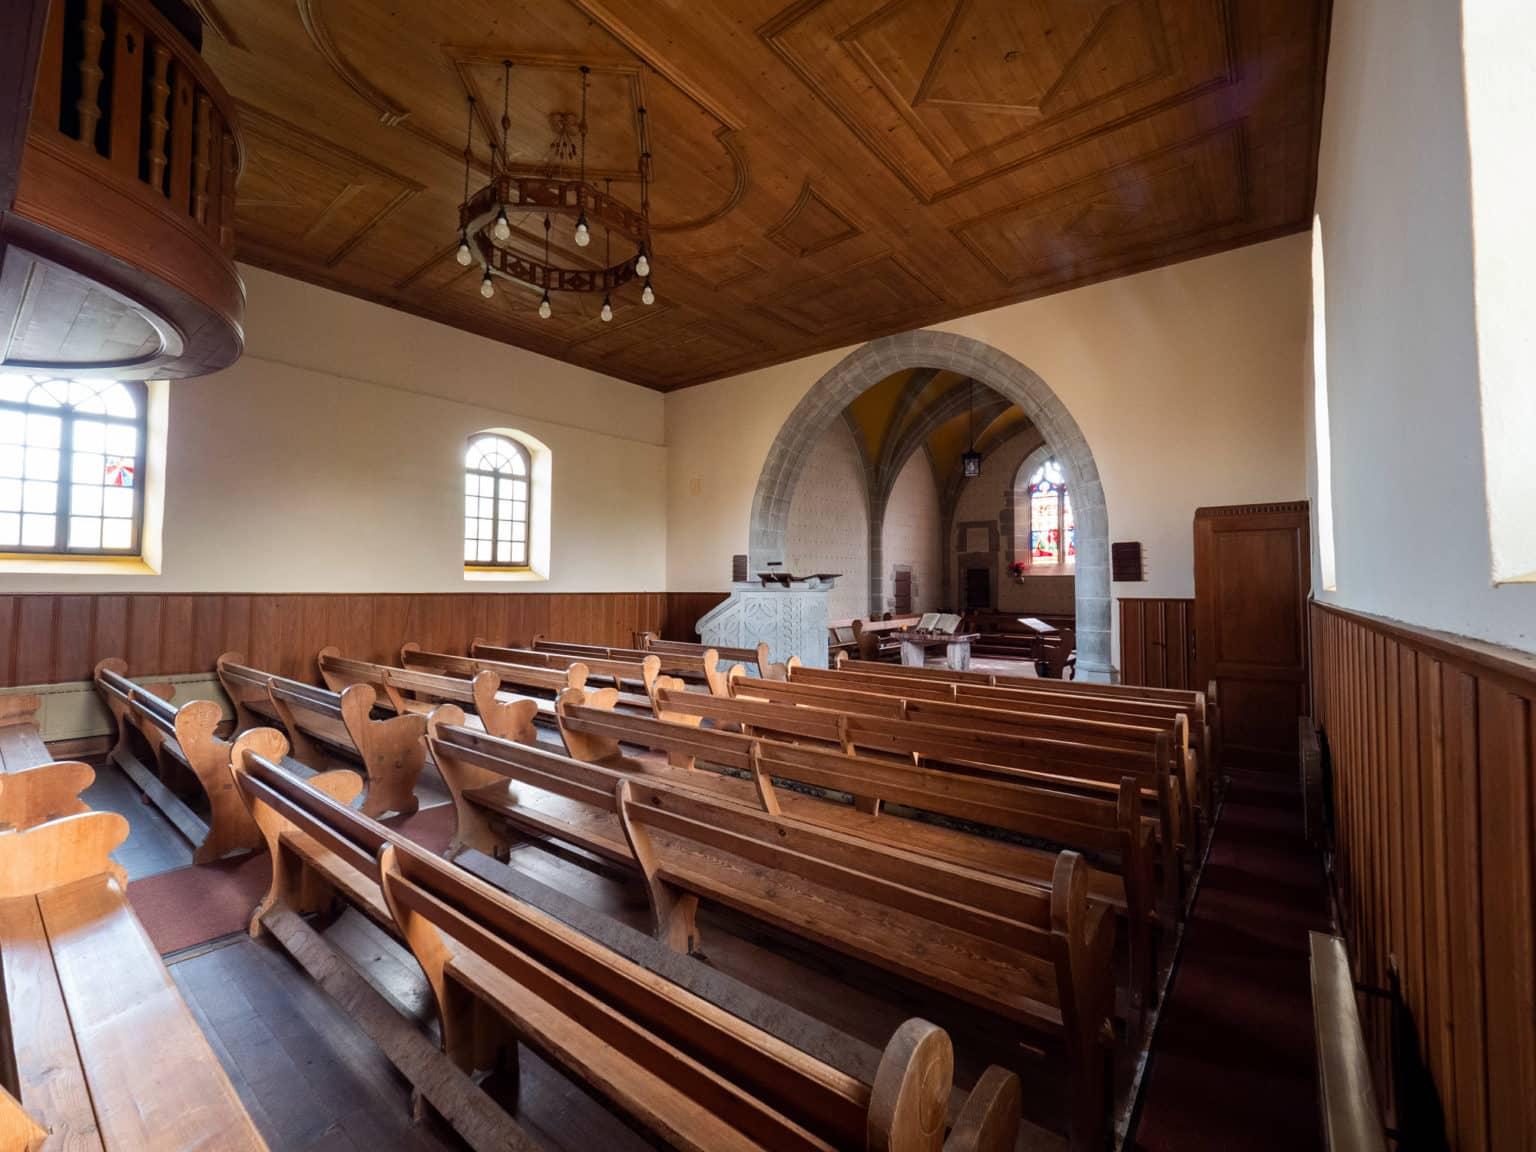 Refuges-salles-Montanaire©V-Dubach-52563